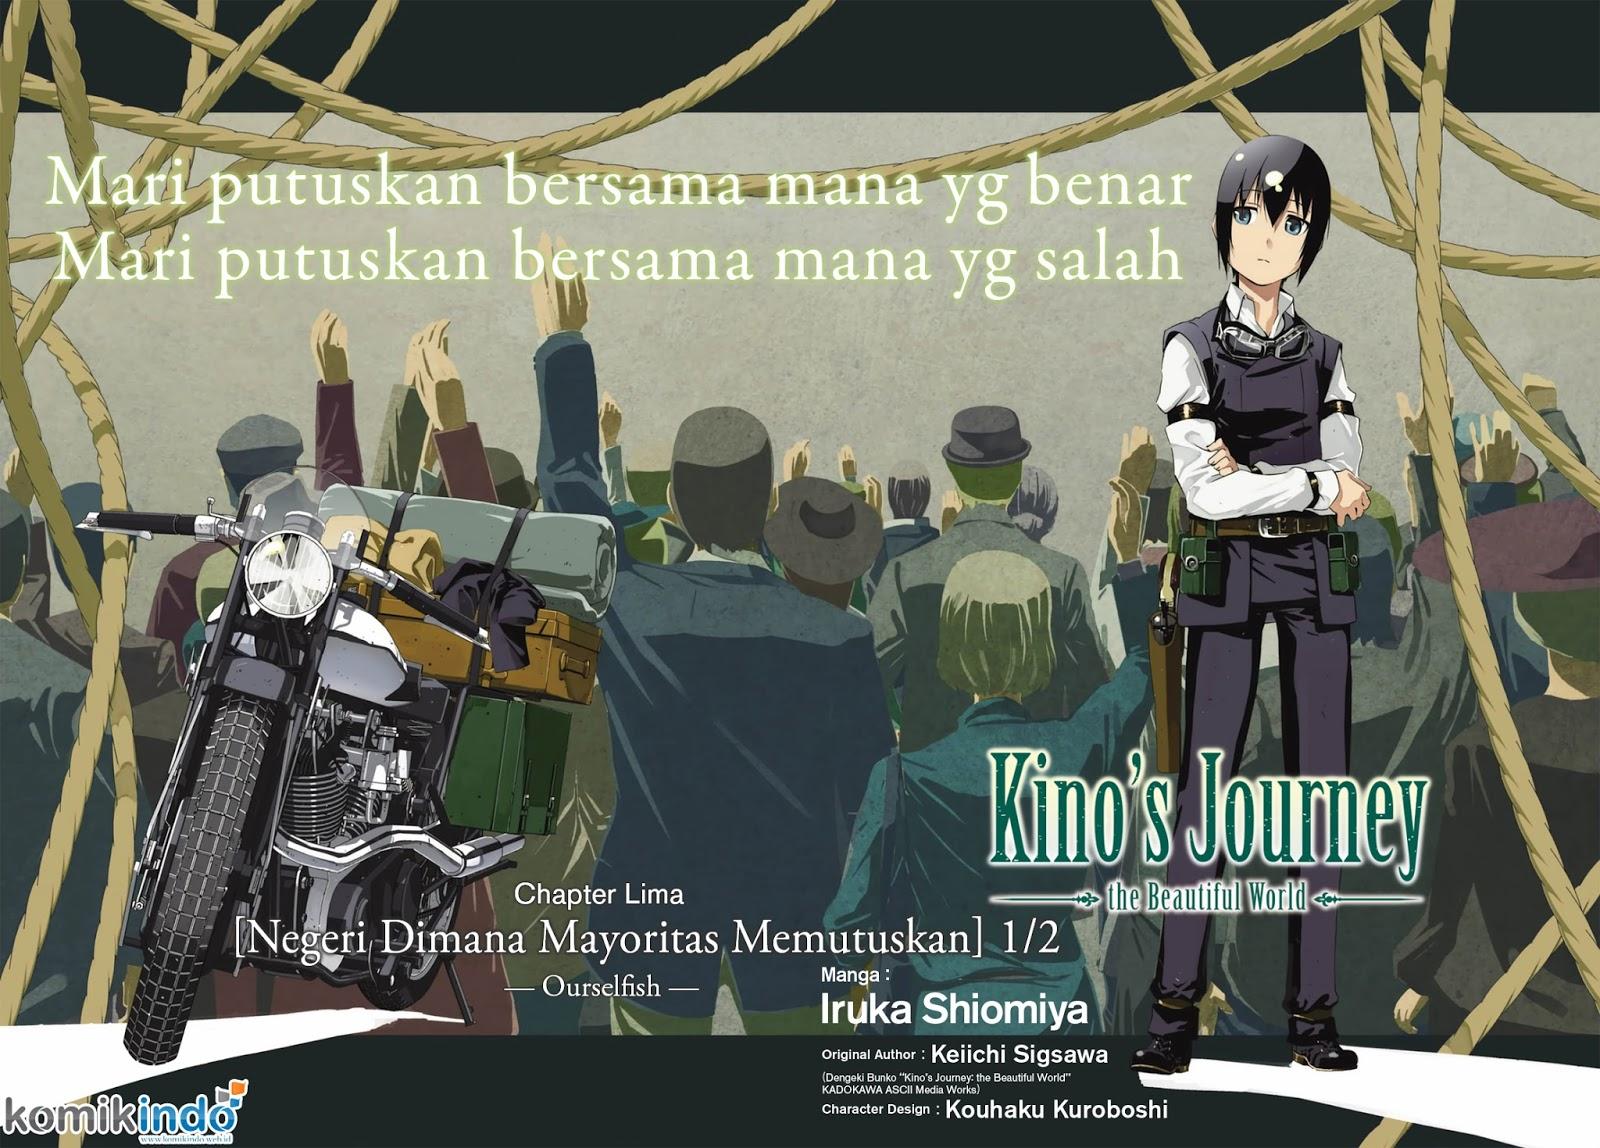 Baca Manga Kino no Tabi -The Beautiful World- (Shiomiya) Chapter 5 Bahasa Indonesia